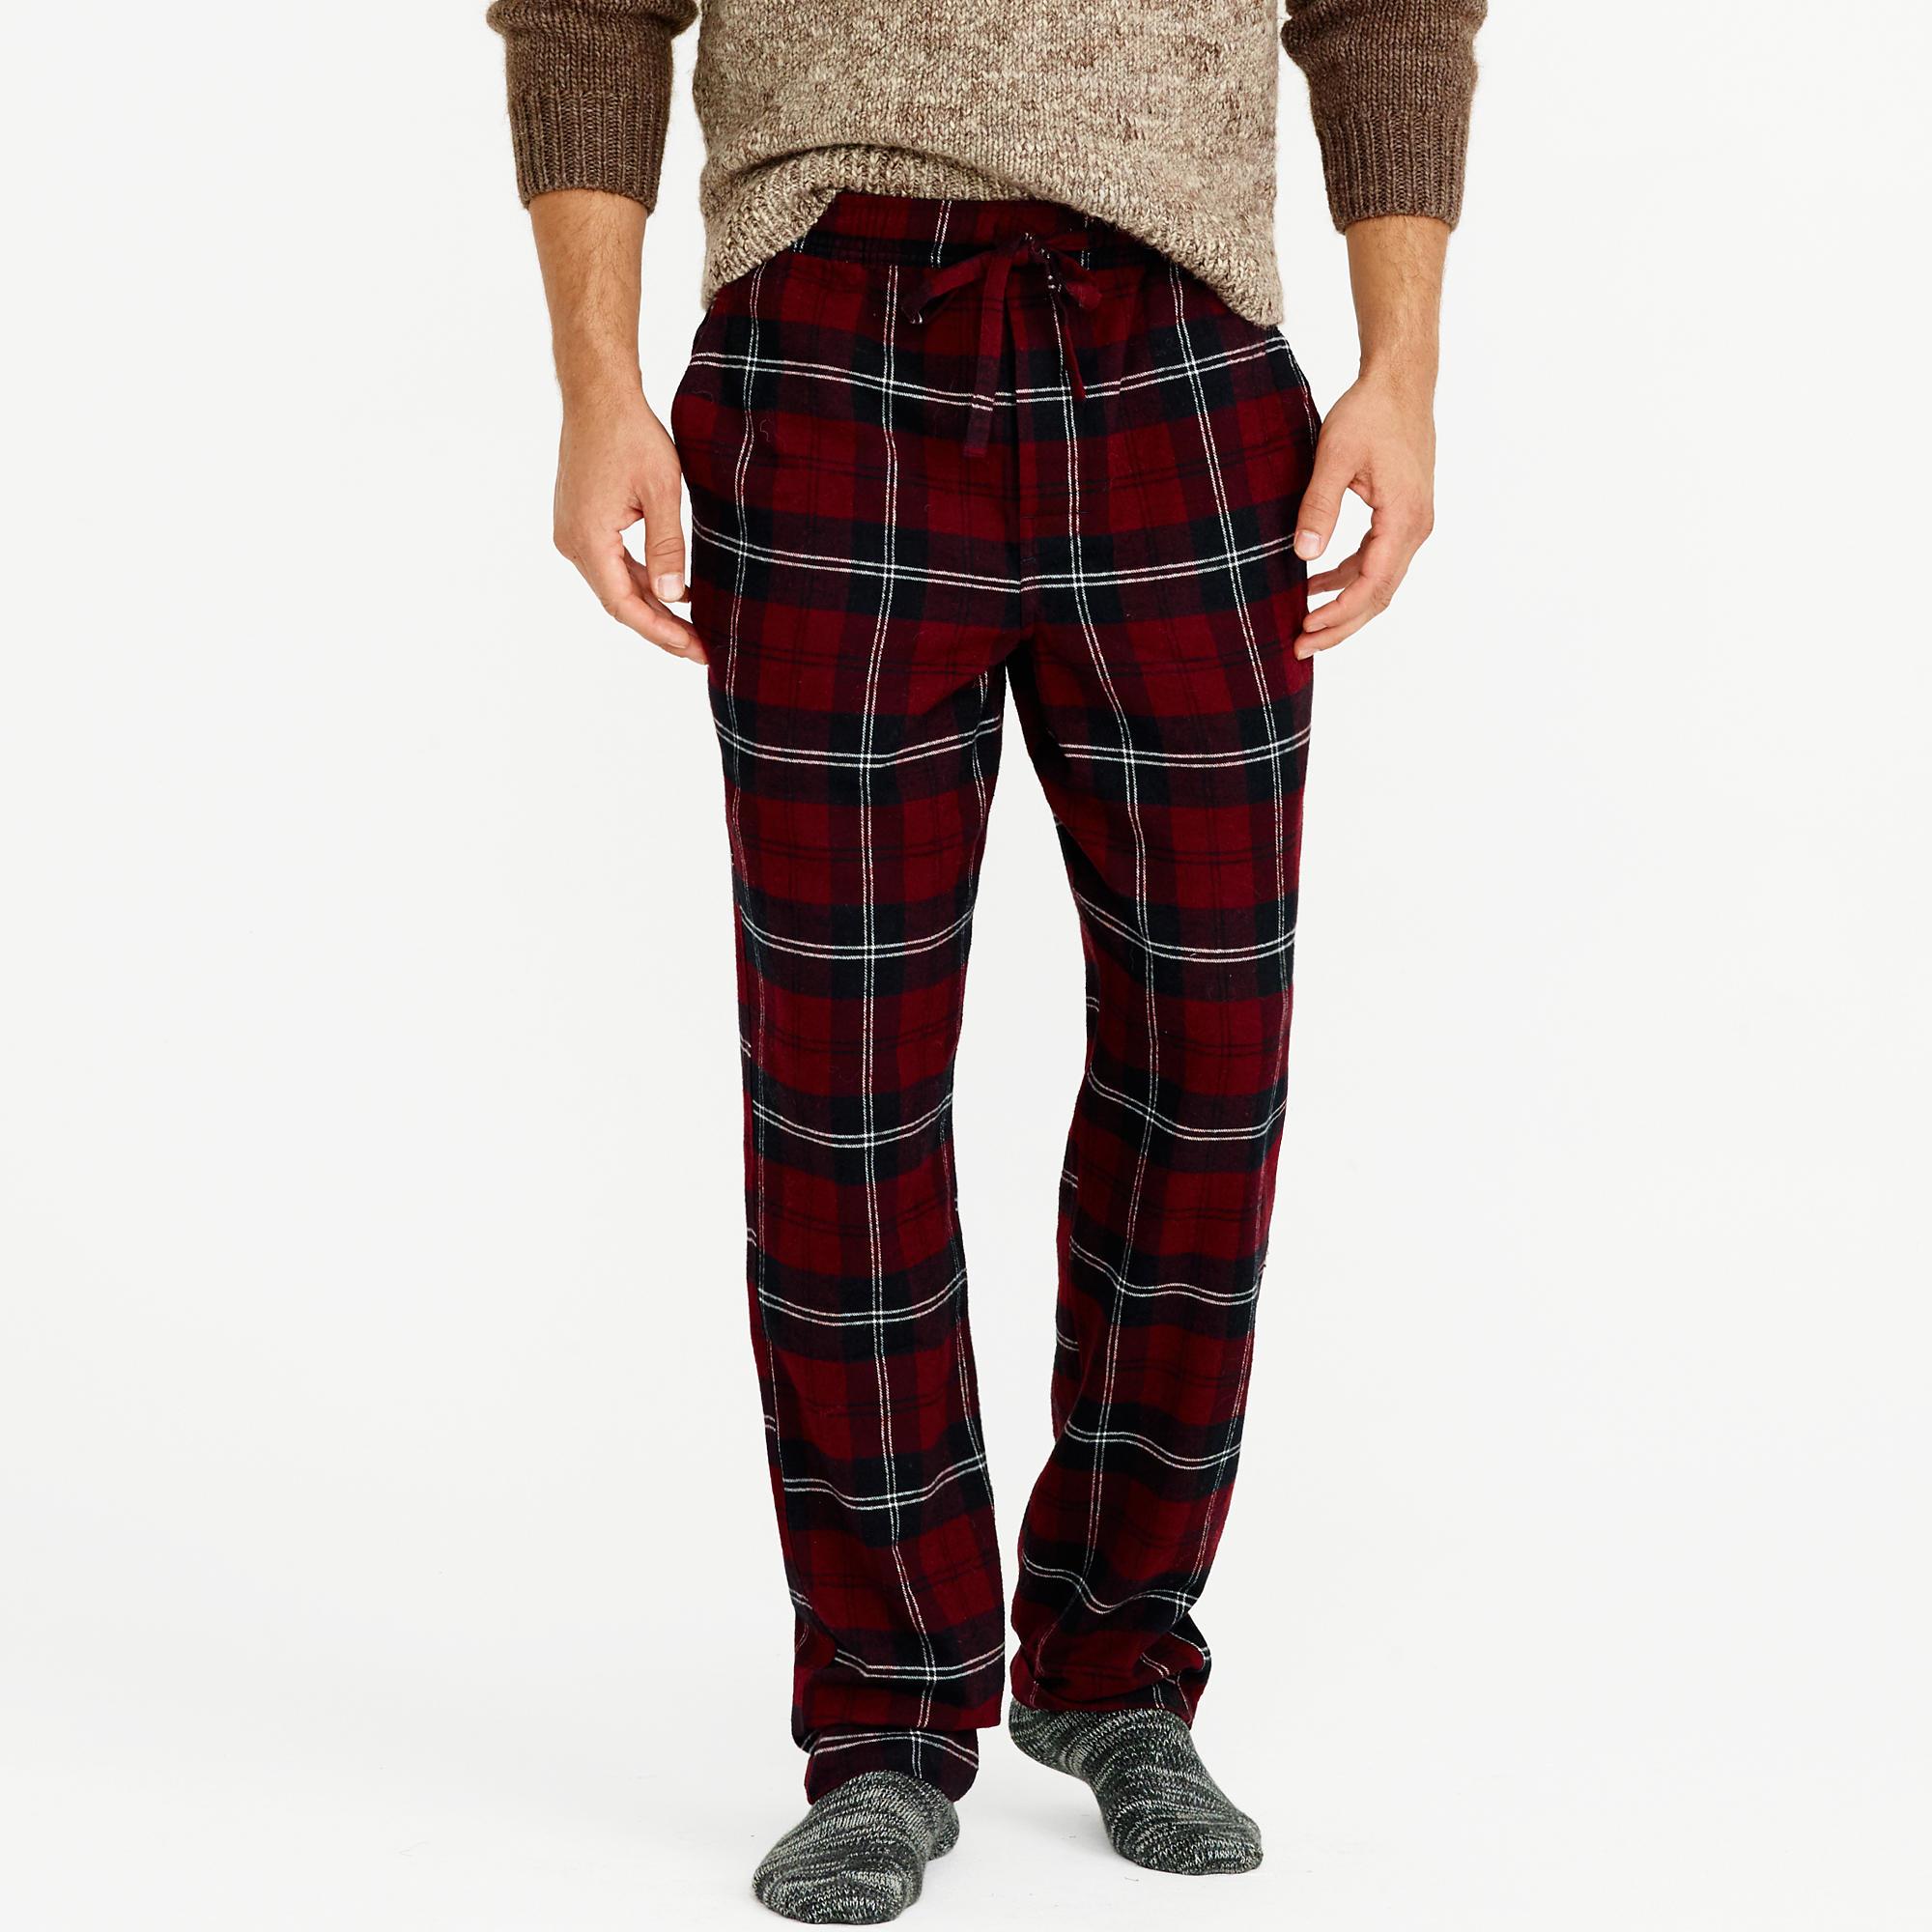 a67e8e7b0c7 Lyst - J.Crew Flannel Pajama Pant In Burgundy Plaid in Purple for Men